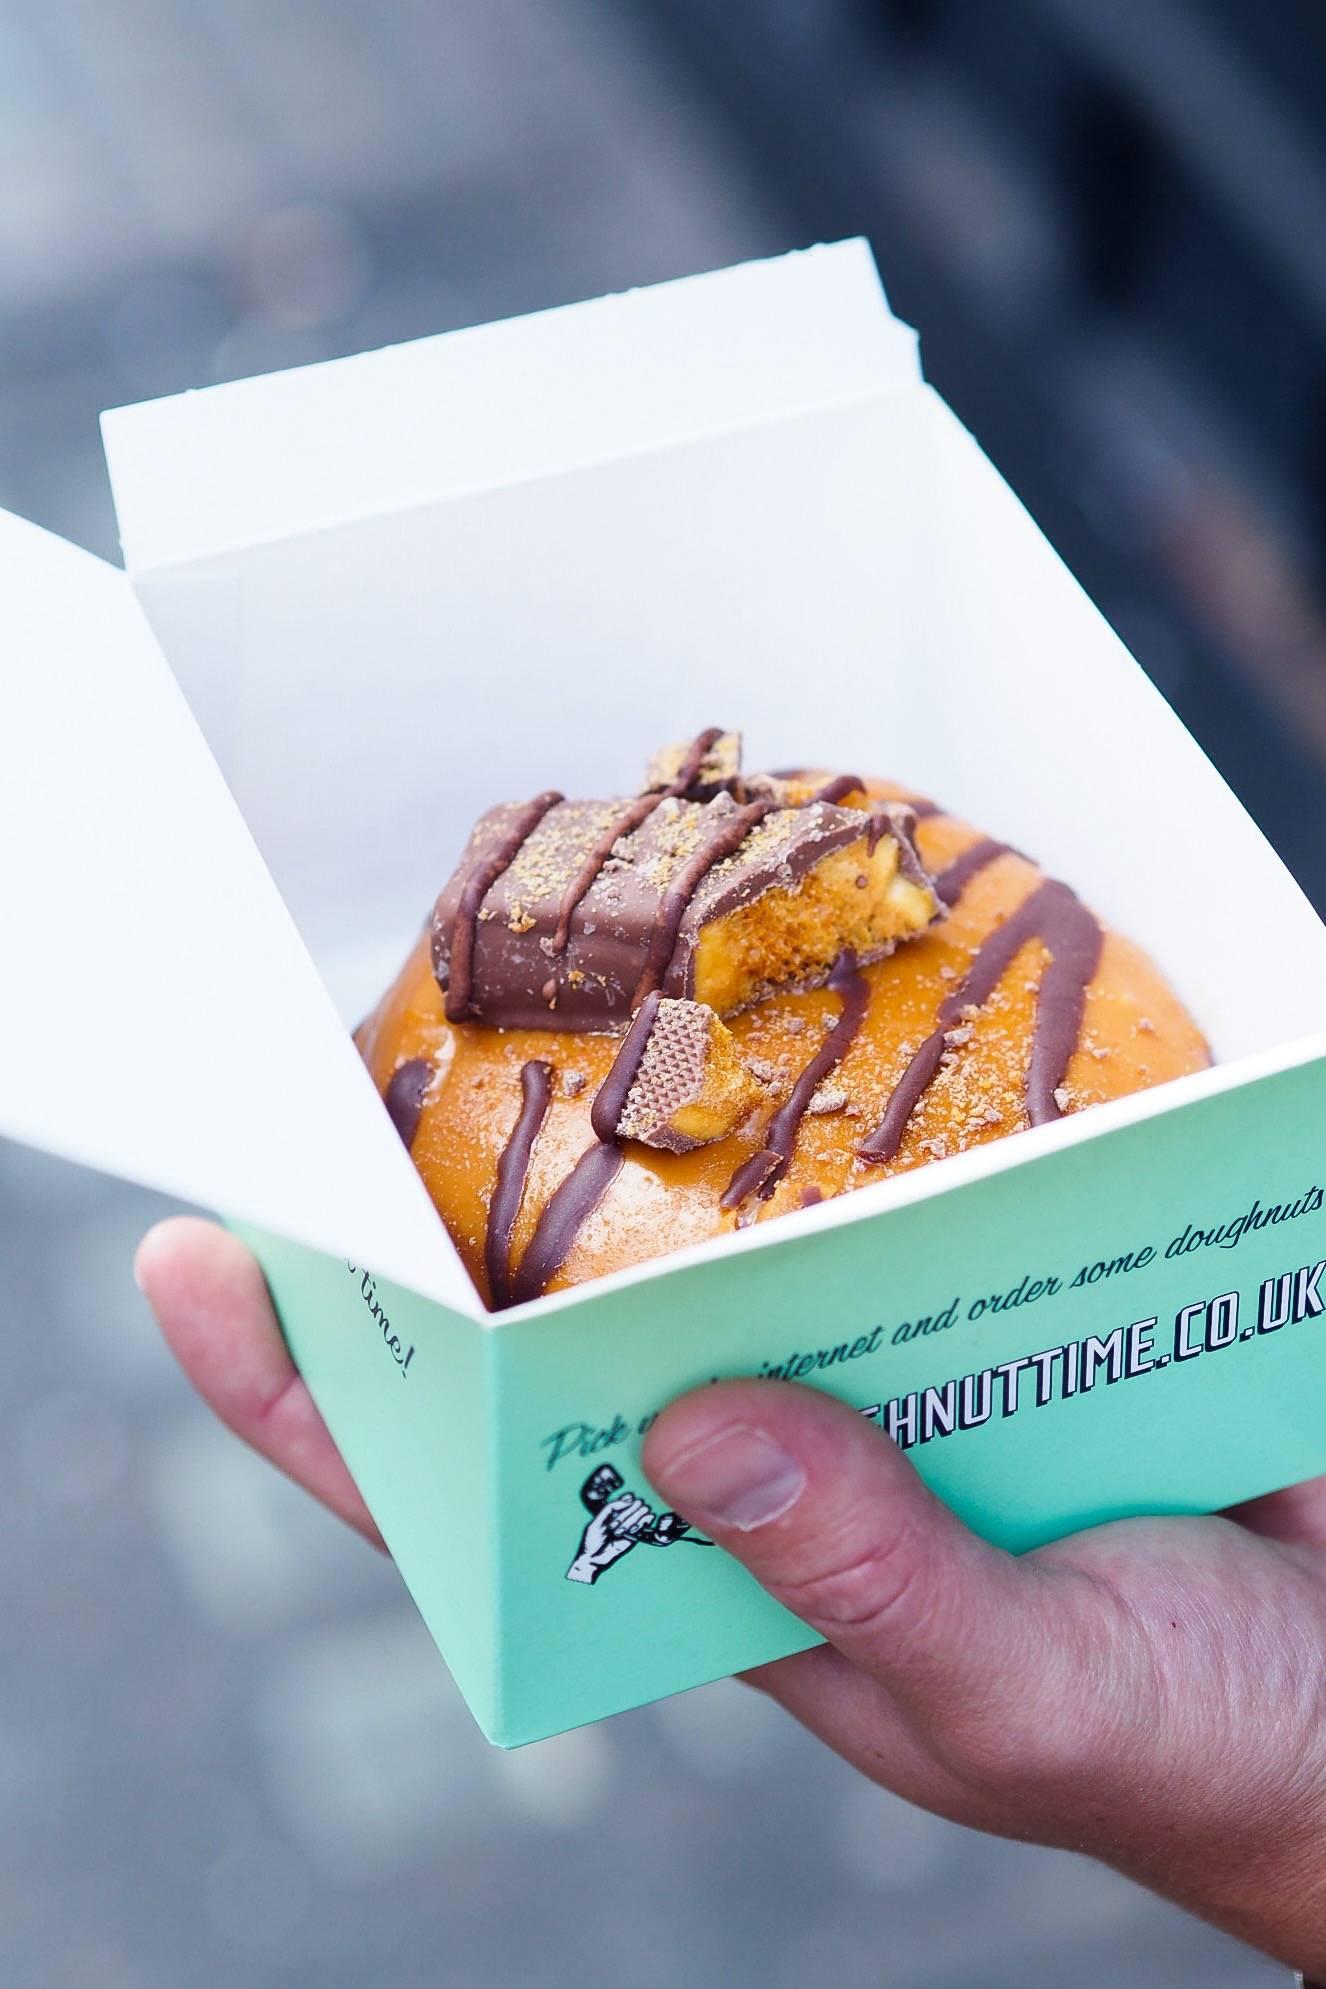 Doughnut_Time_Soho_honey